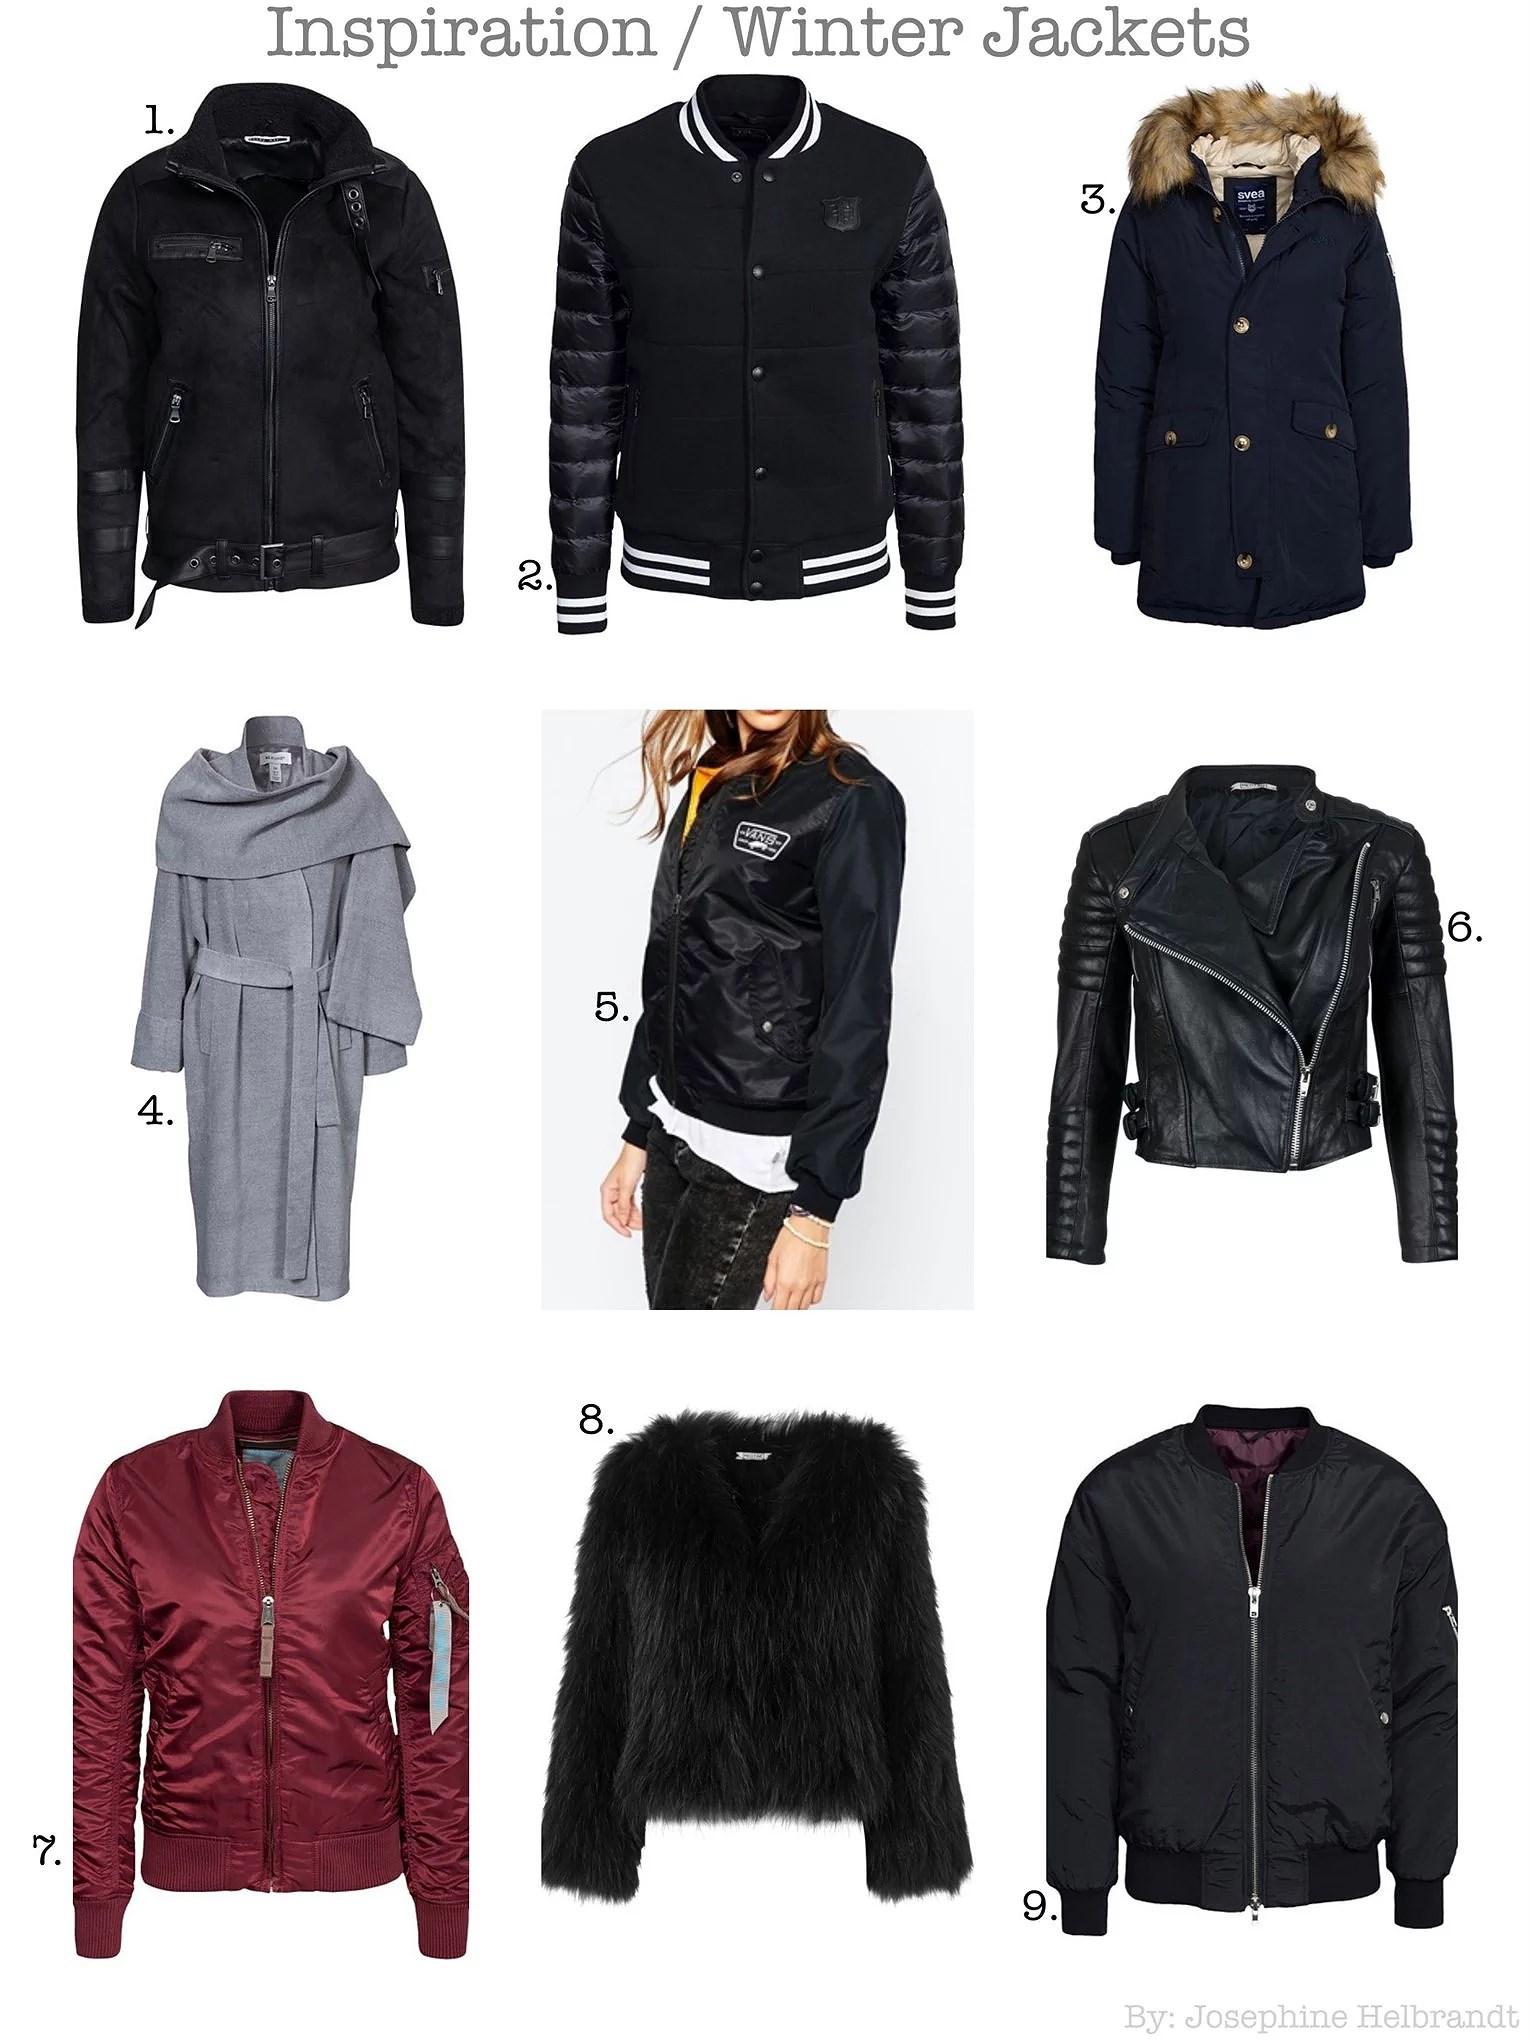 Inspiration // Winter Jackets